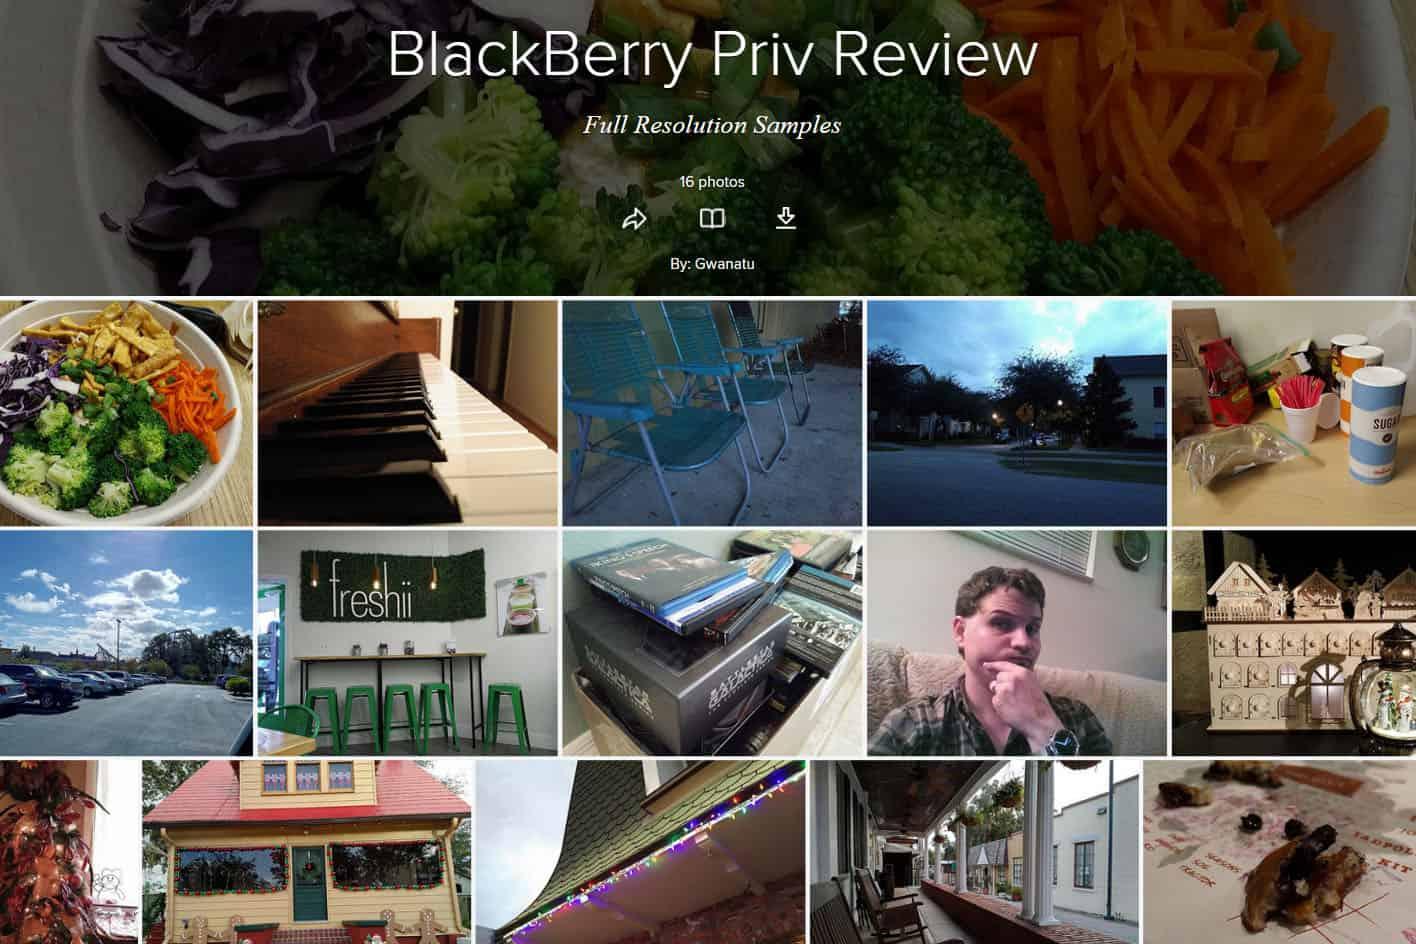 blackberry-priv-ah-flickr